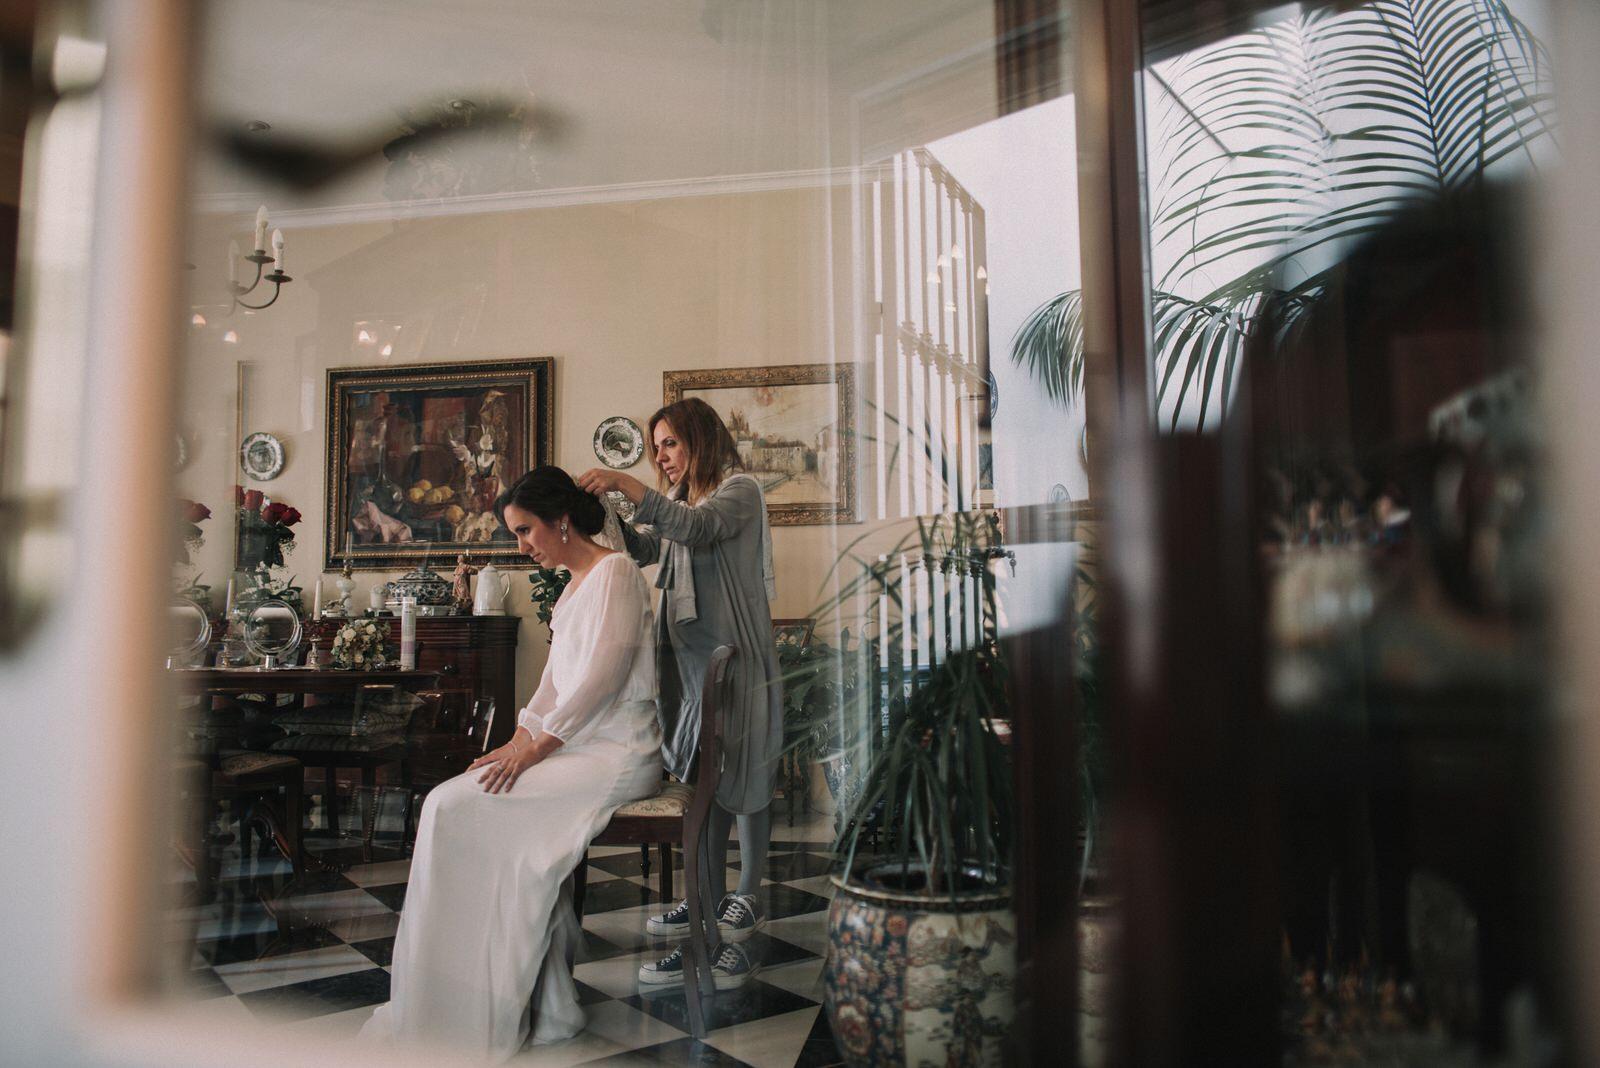 fotografo de bodas sevilla - fotografo boda - fotografía sevilla - Andrés AmarilloAAA_2872- fine.JPG